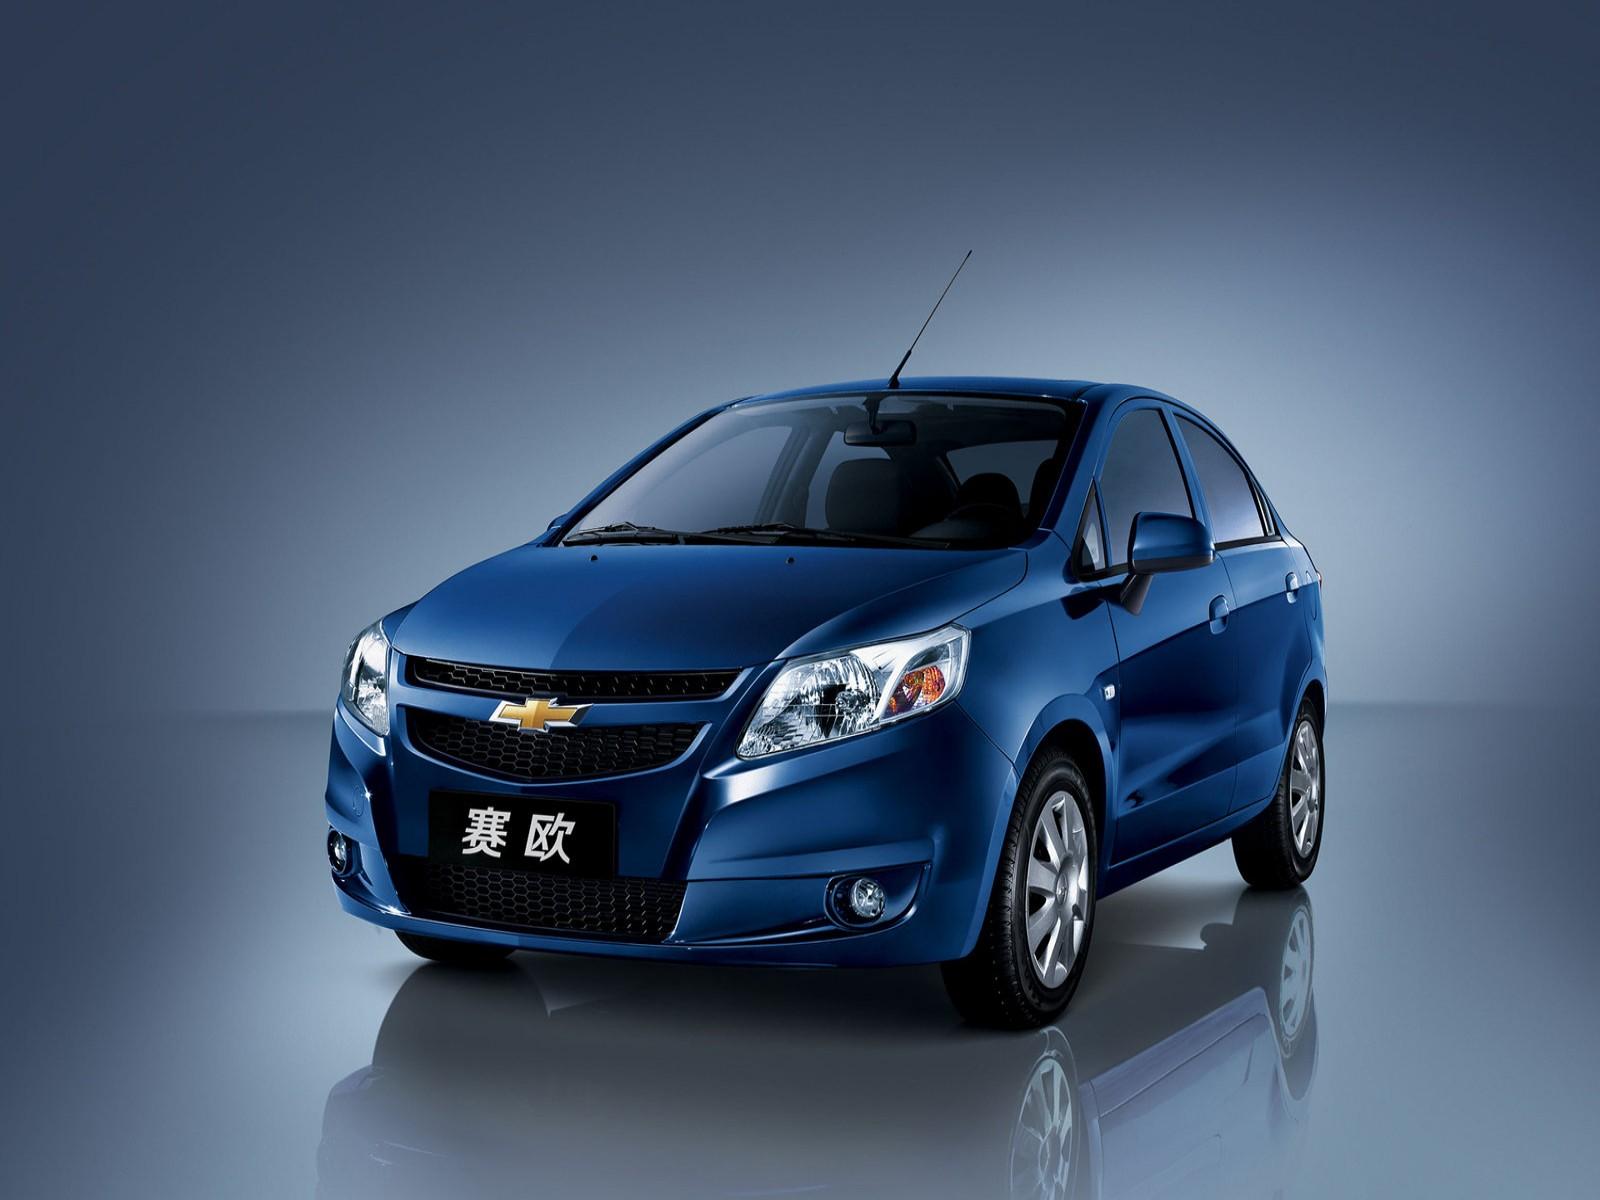 auto cars new 2011 - photo #6